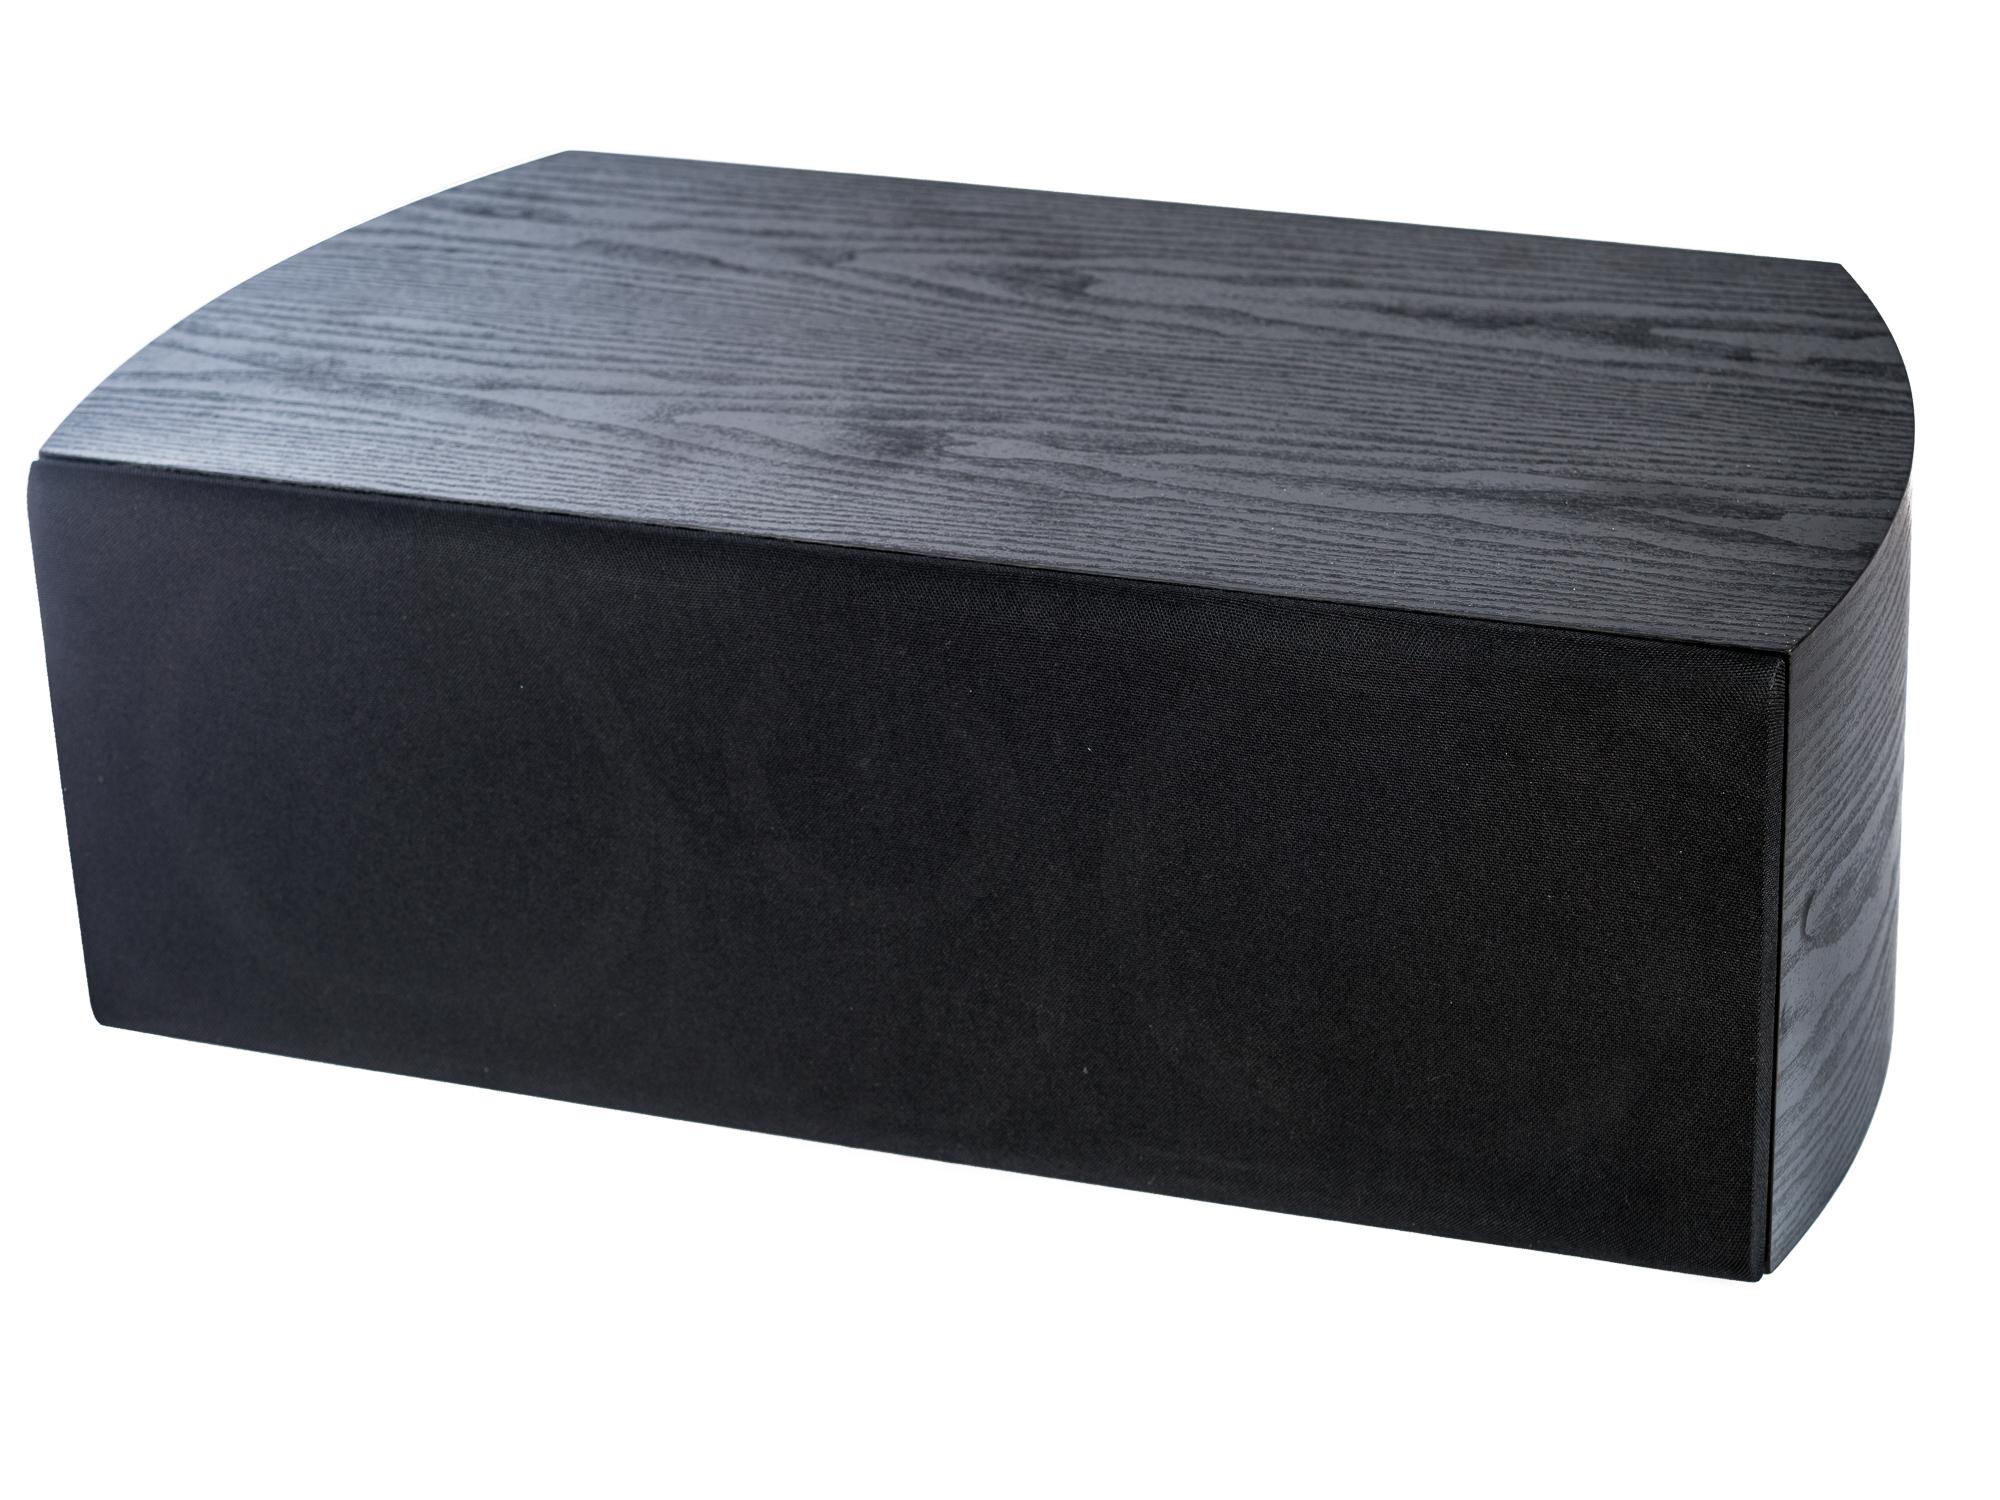 PG Audio universeller XL Center Lautsprecher, 2 Wege Bassreflex, schwarz, Neu-Ware – Bild 3